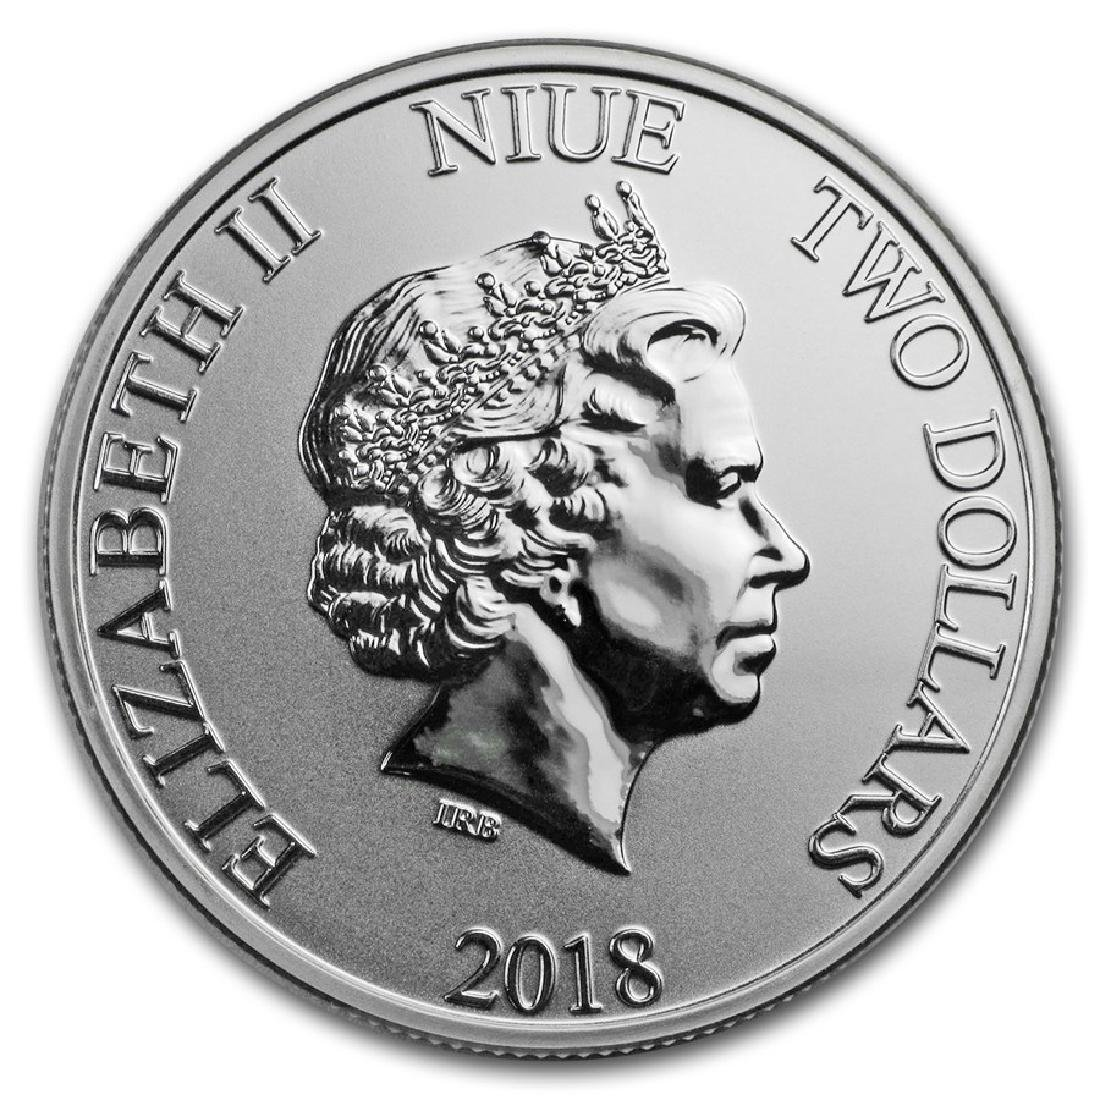 2018 $2 Disney Lunar Year of the Dog Niue Silver Coin - 2